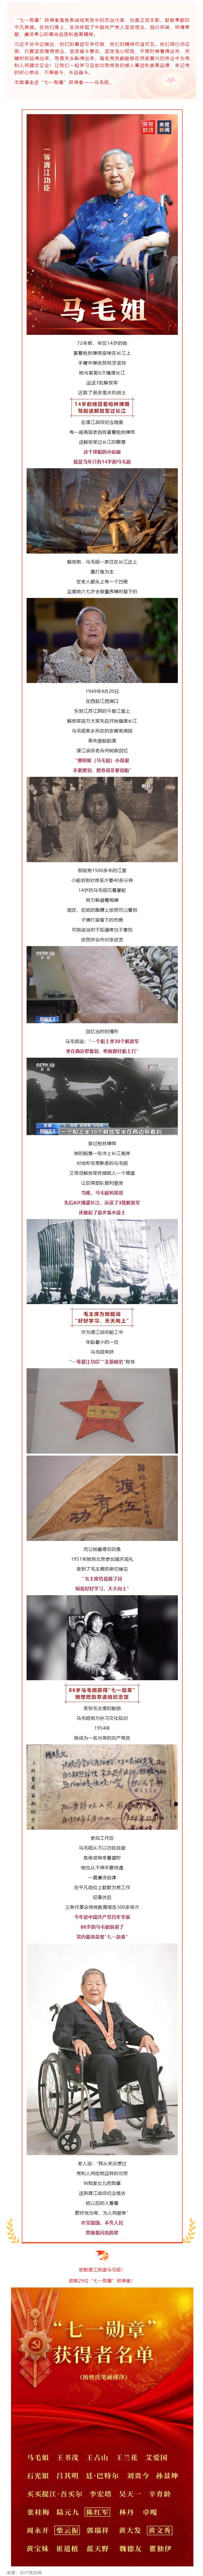 "FireShot Capture 229 - ""七一勋章""获得者-马毛姐:跟着共产党,老百姓才有好日子过 - mp.weixin.qq.com.png"